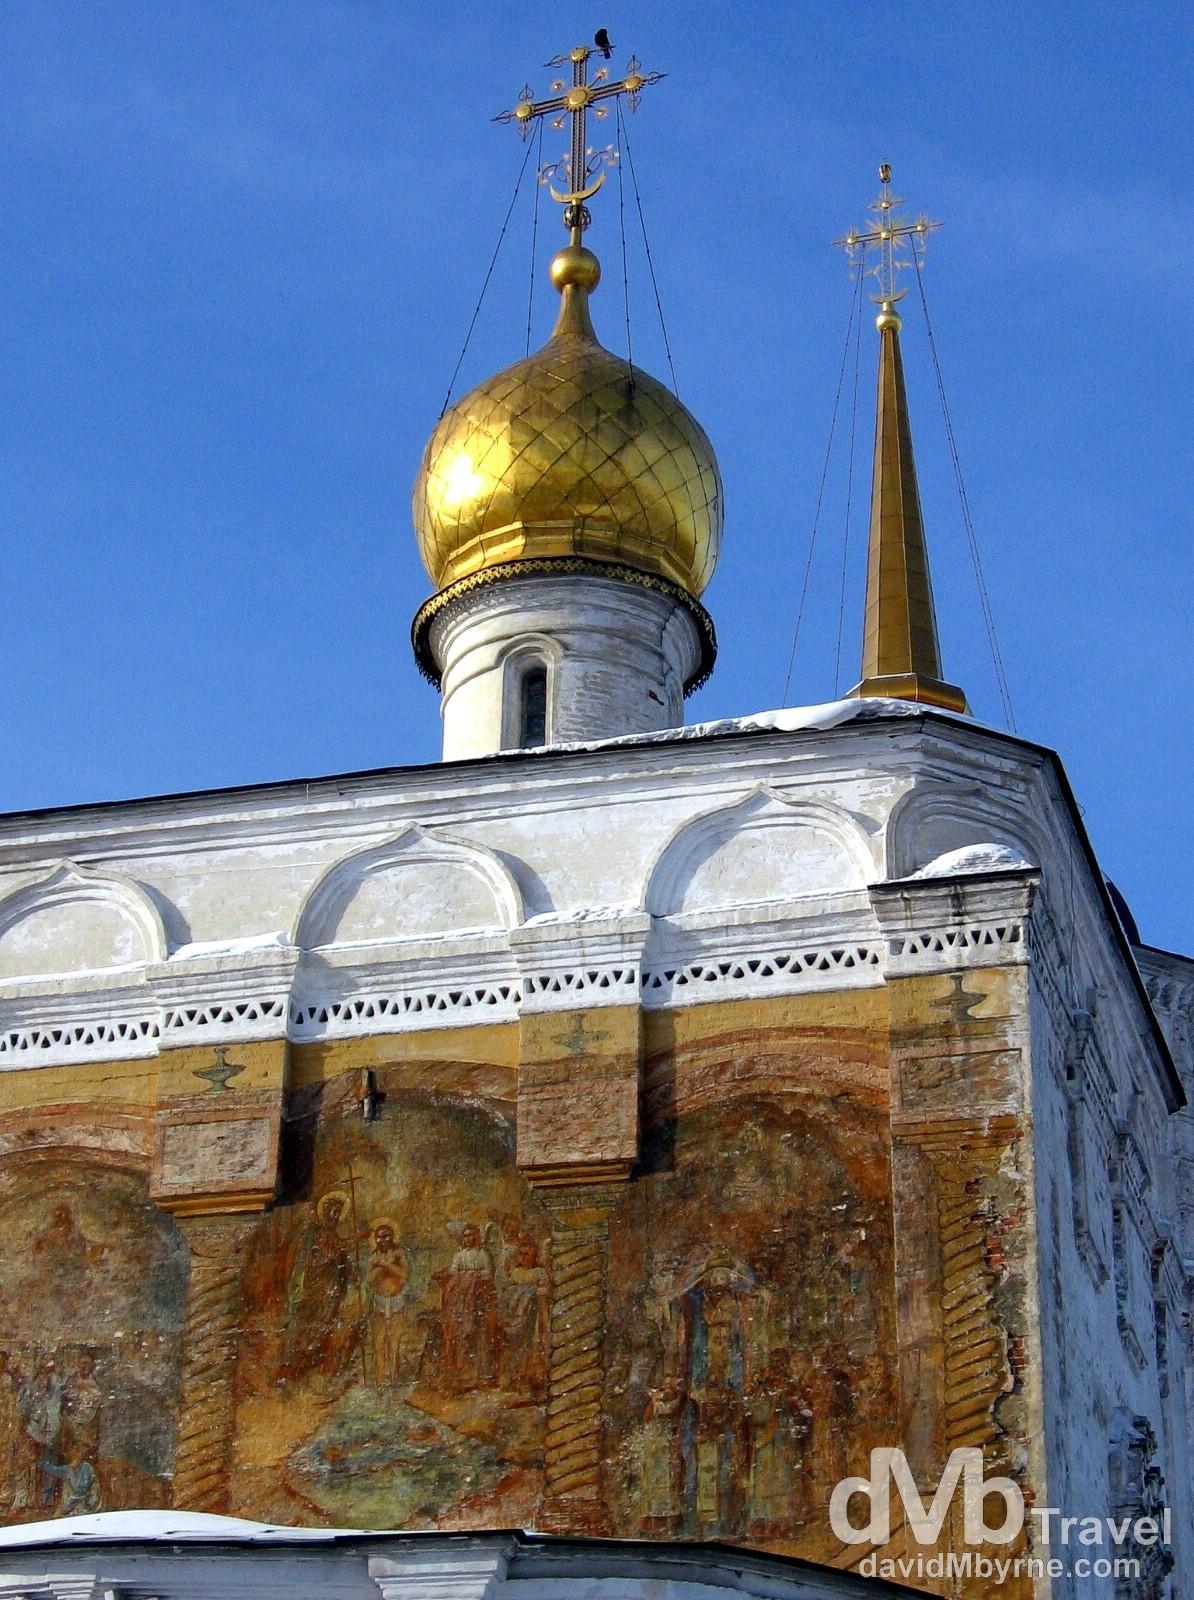 My first sighting of the famous, quintessentially Russian onion domes. Spasskaya Church, Irkutsk, Siberian Russia. February 18, 2006.